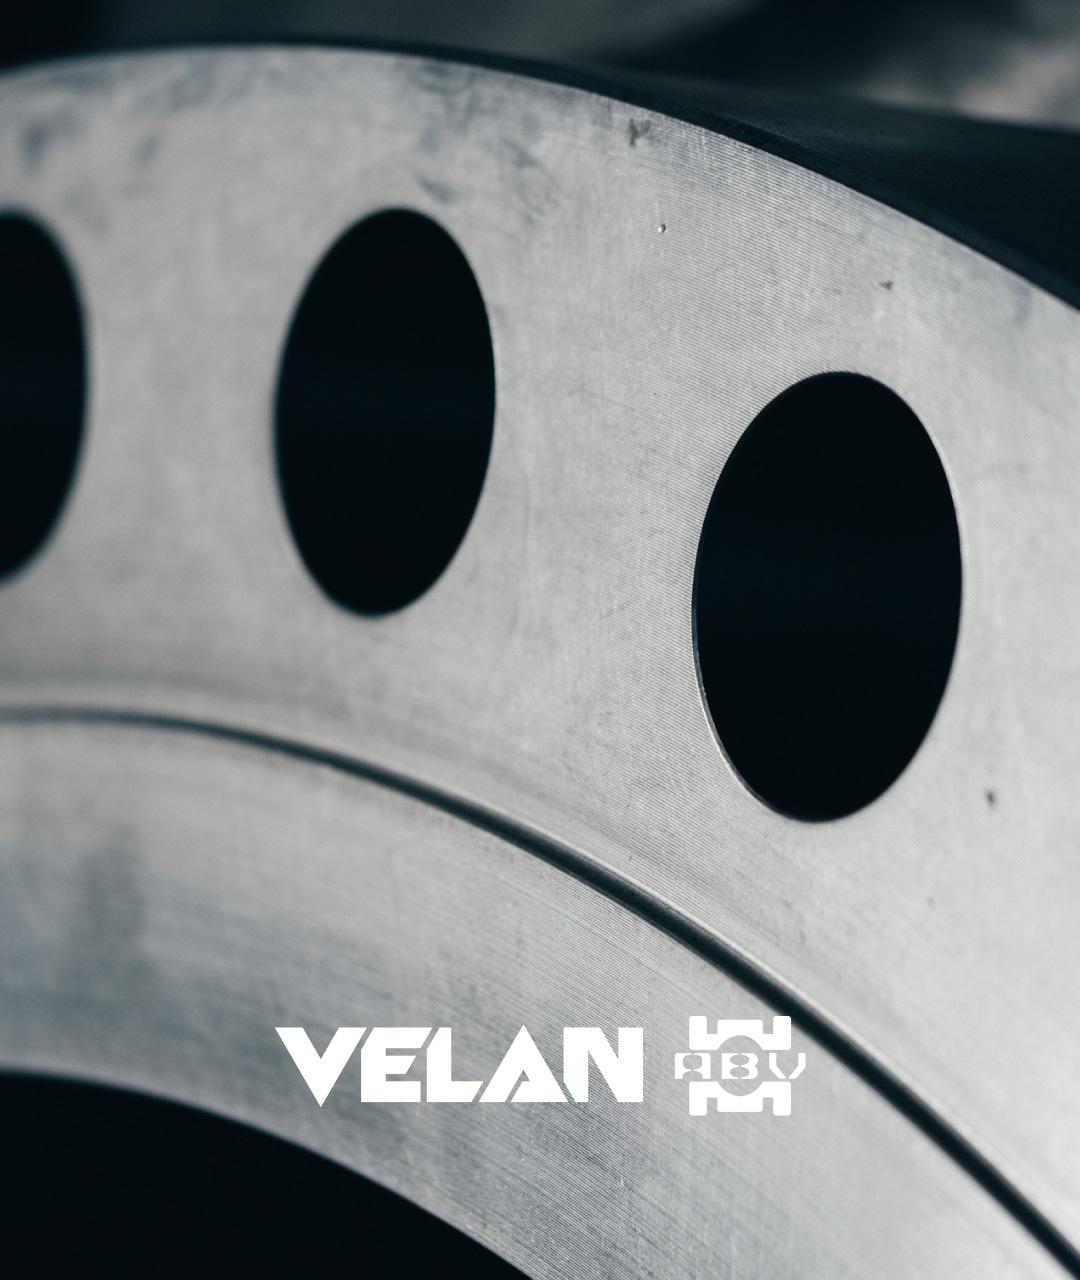 Velan case history